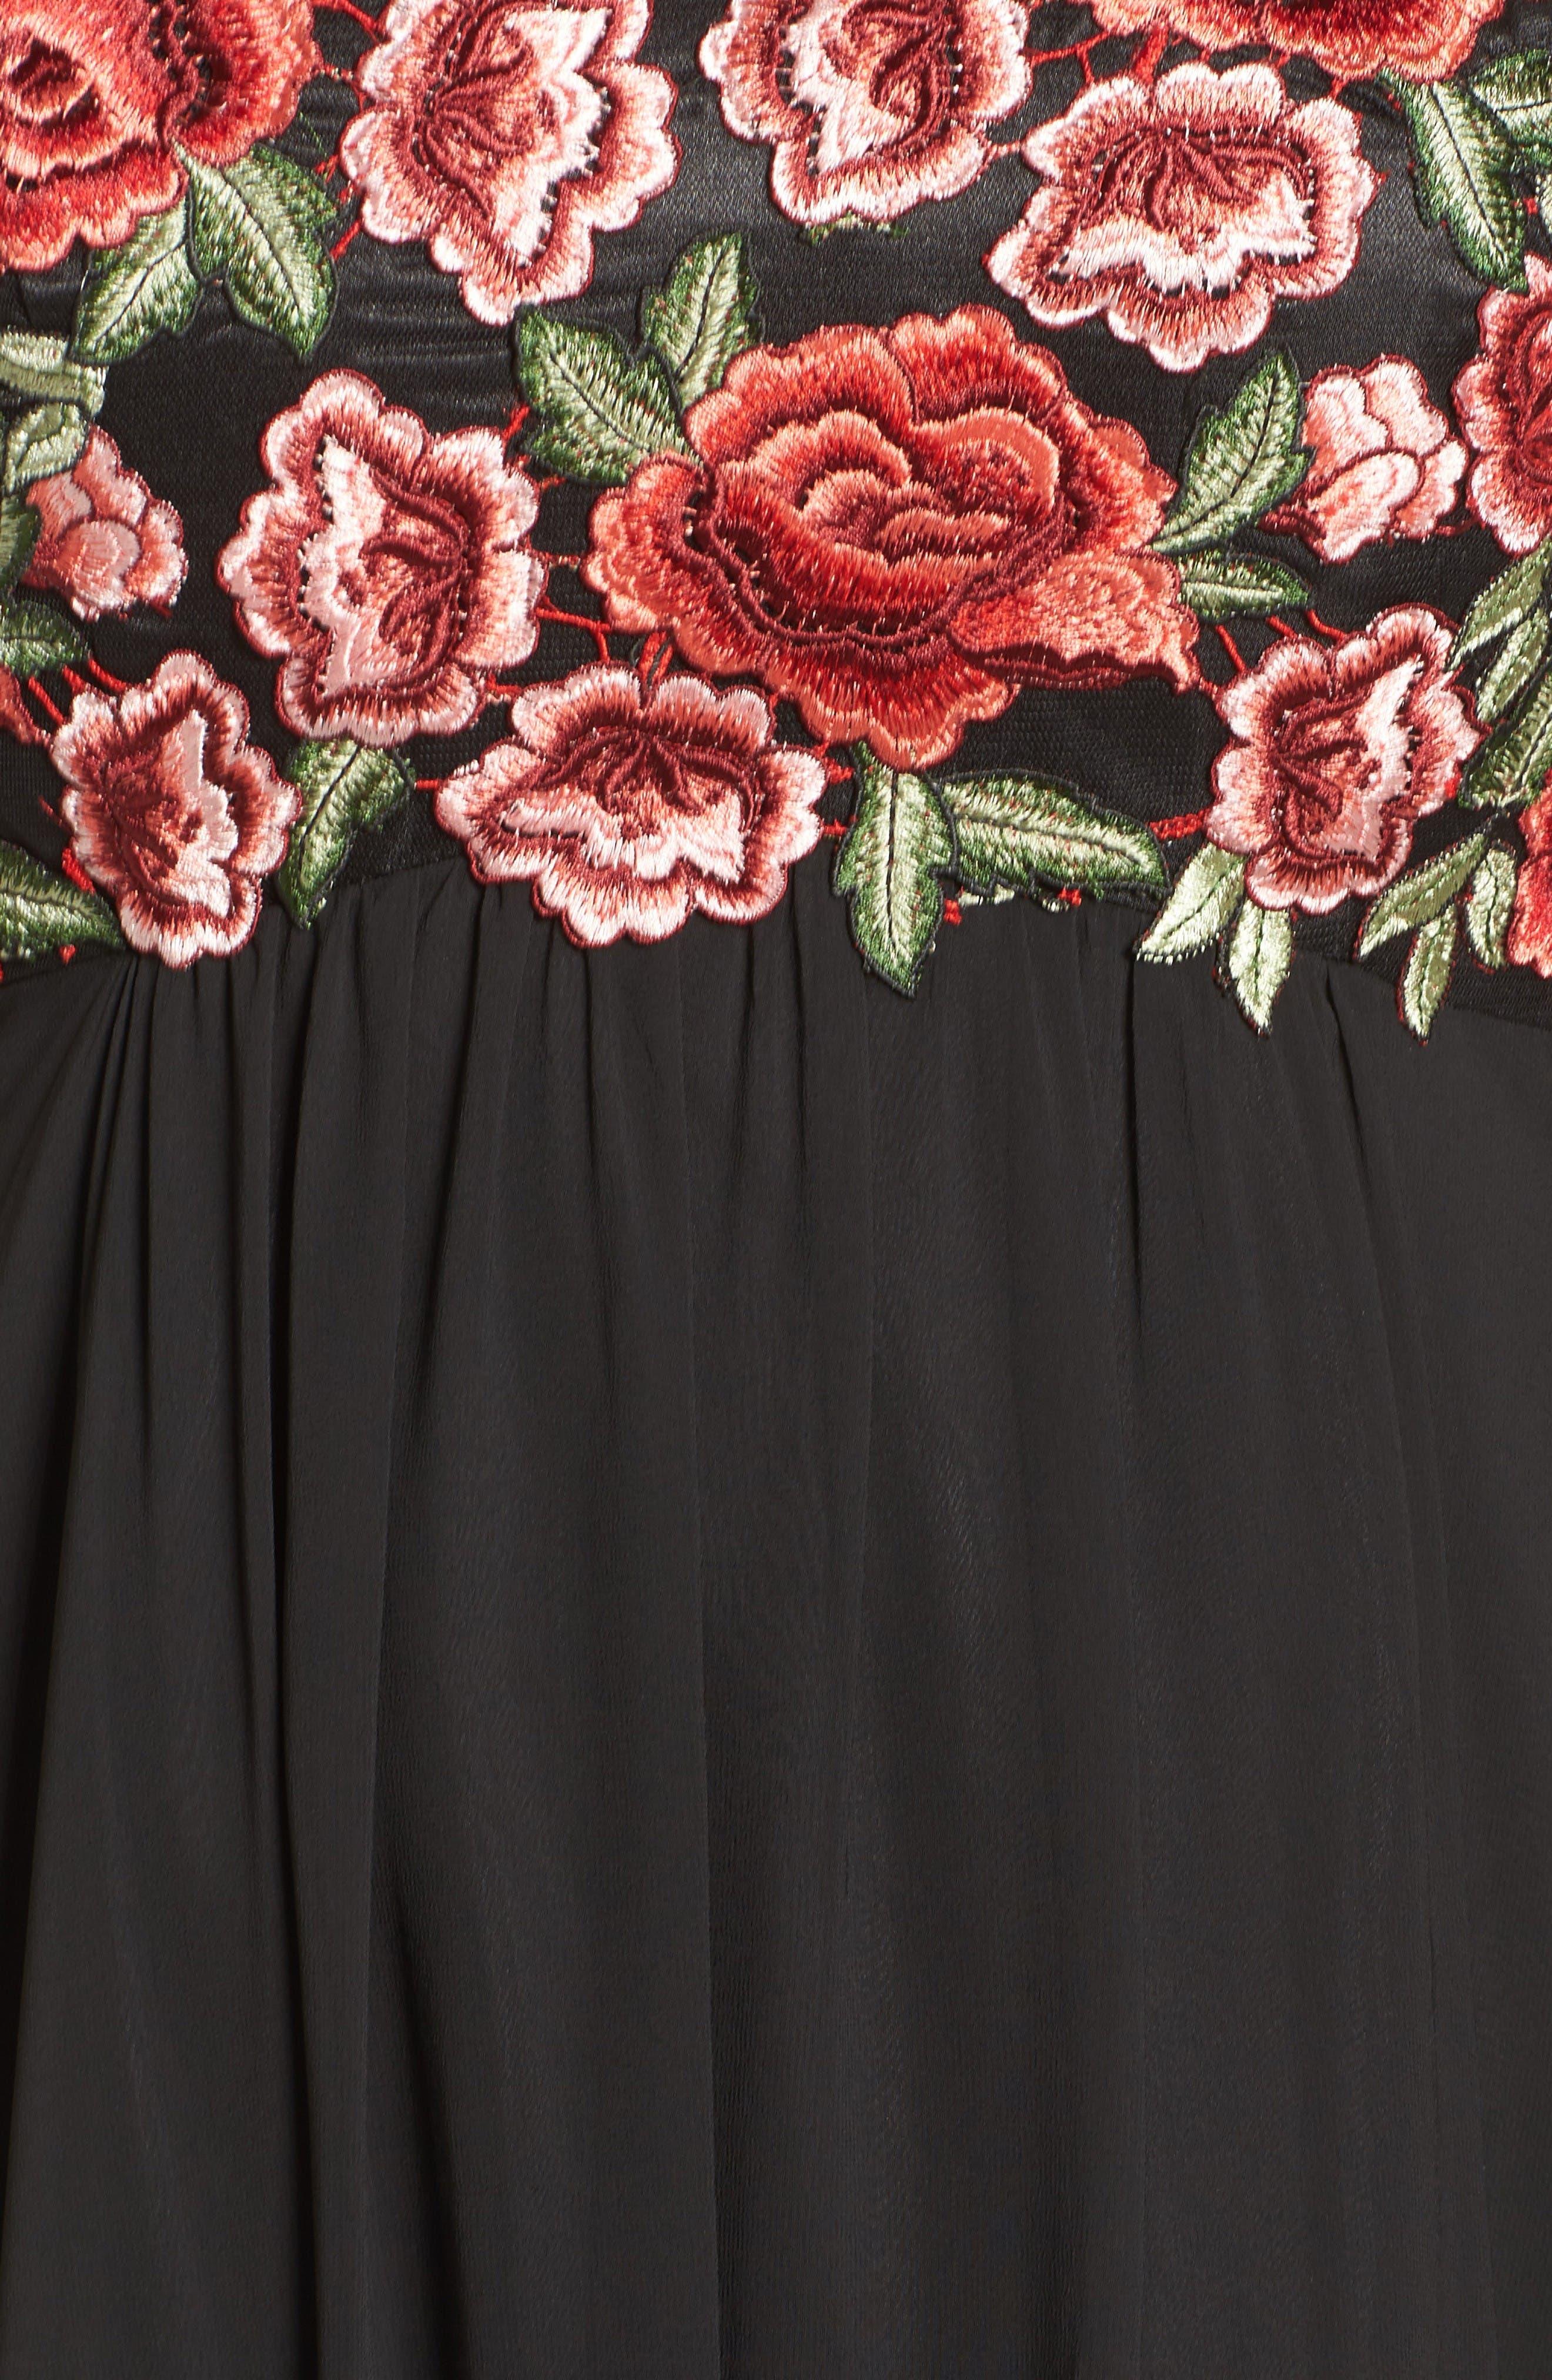 Floral Appliqué Strapless Gown,                             Alternate thumbnail 5, color,                             Black/ Red